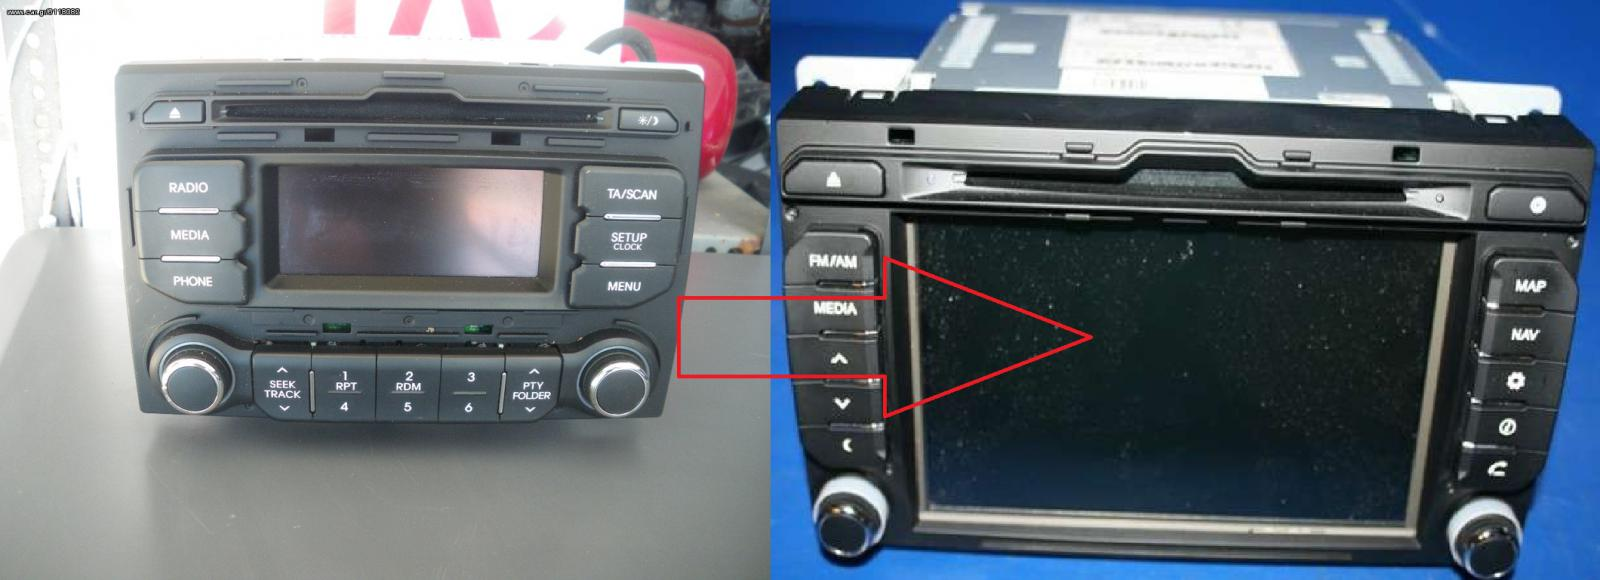 Kia rio navigation system installation 6118082_1_b jpg